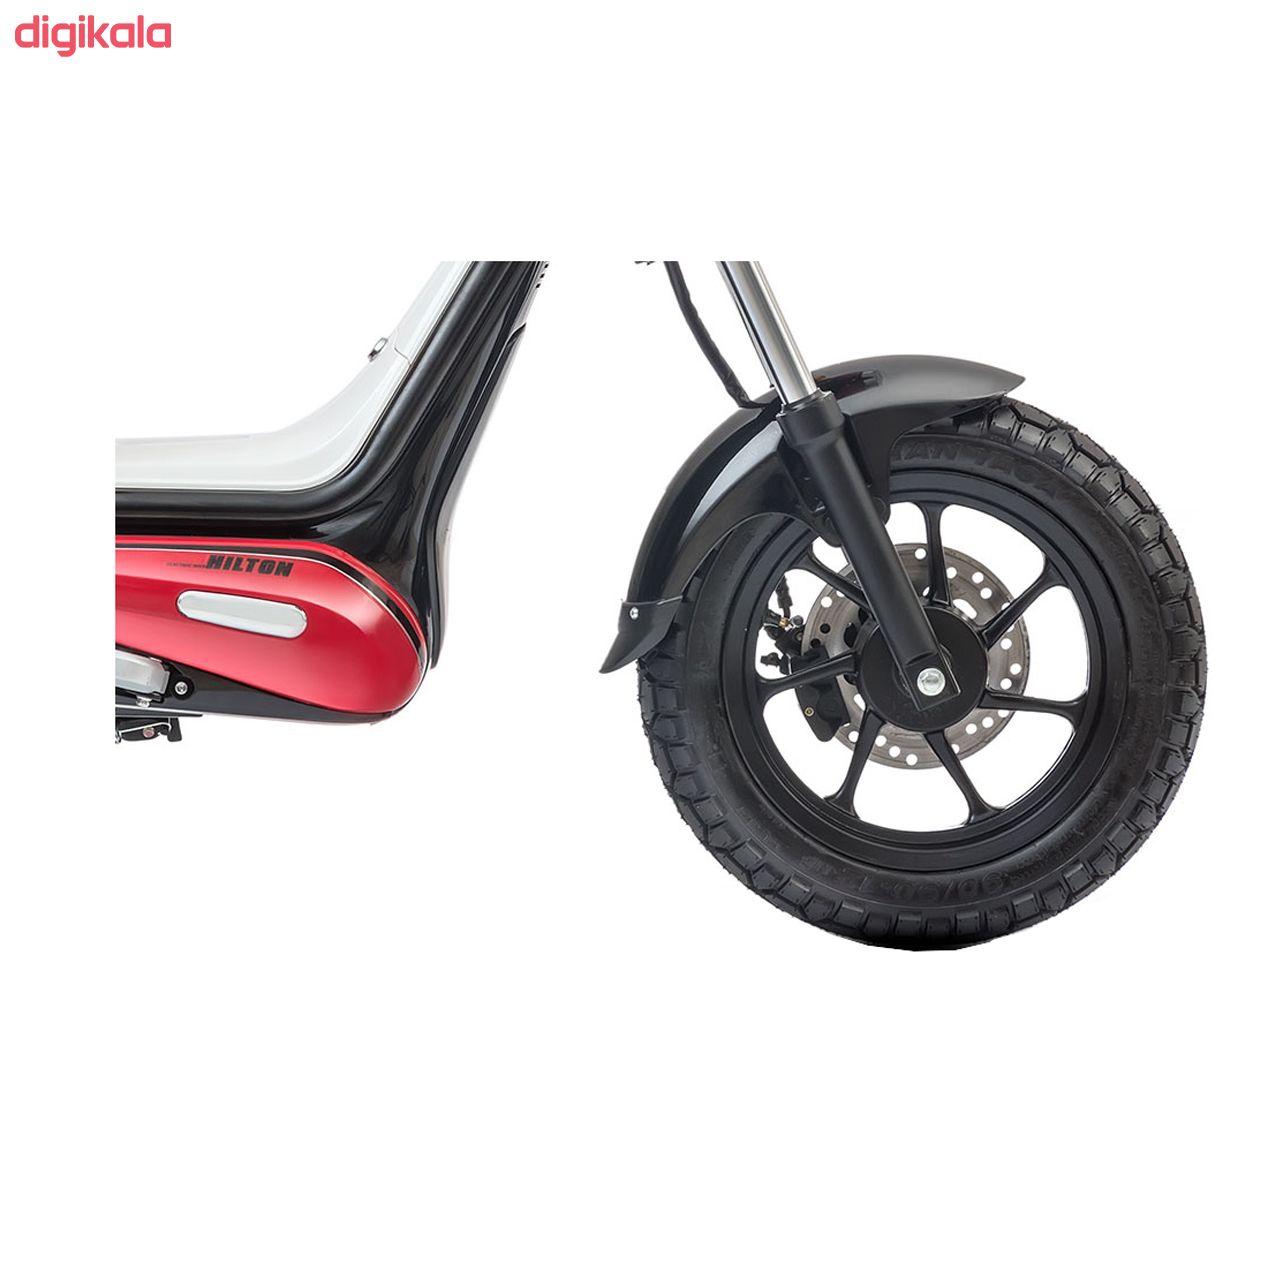 موتورسیکلت  گلکسی مدل 1500ETسی سی سال 1399 main 1 1